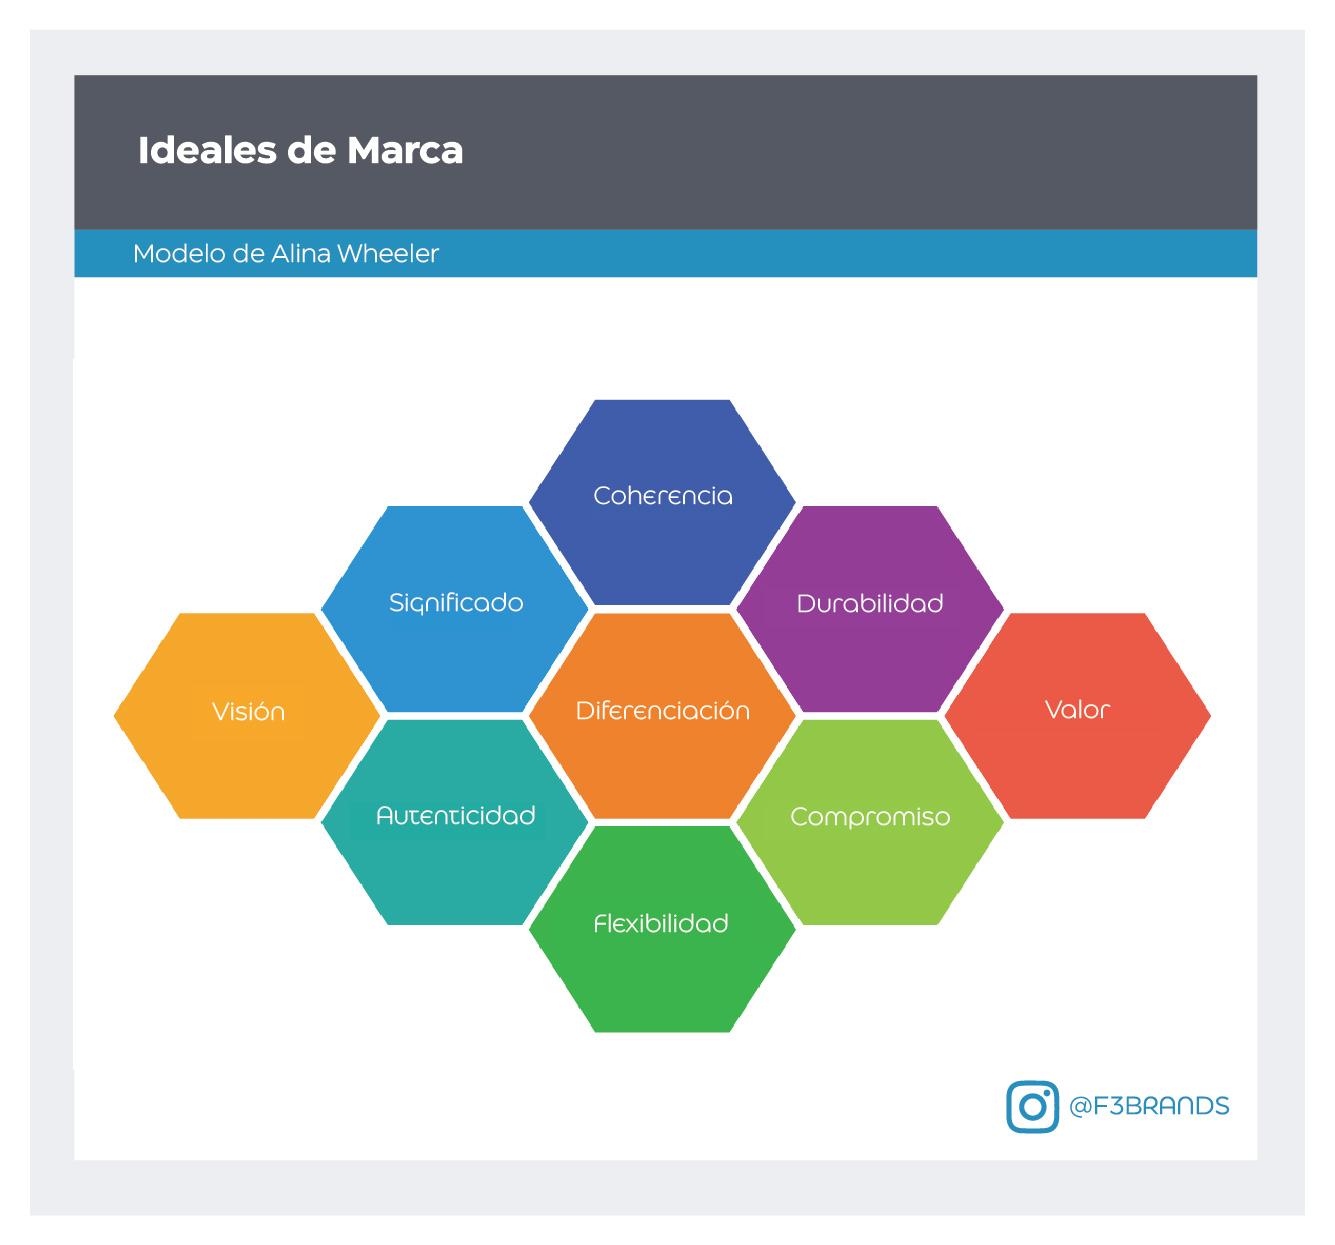 Ideales-DE-MARCA-Rodrigo-Cordova-F3-01